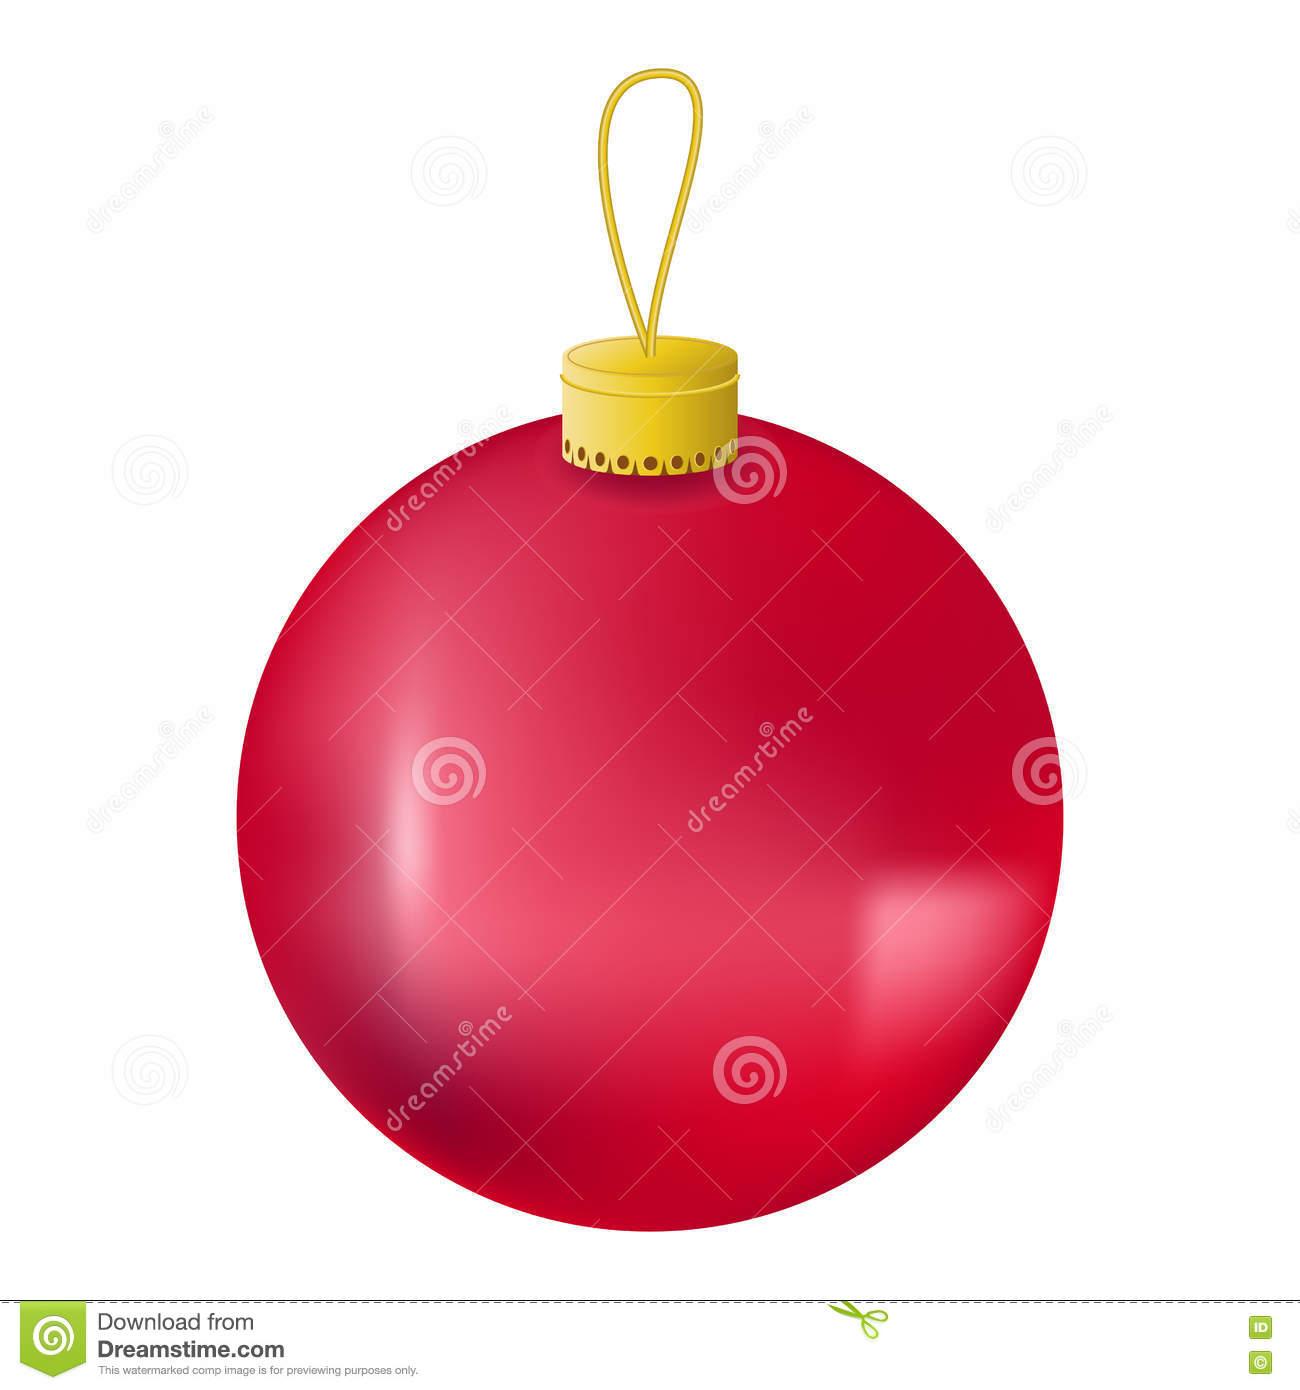 Red Christmas Tree Ball Realistic Illustration. Christmas Fir Tree.